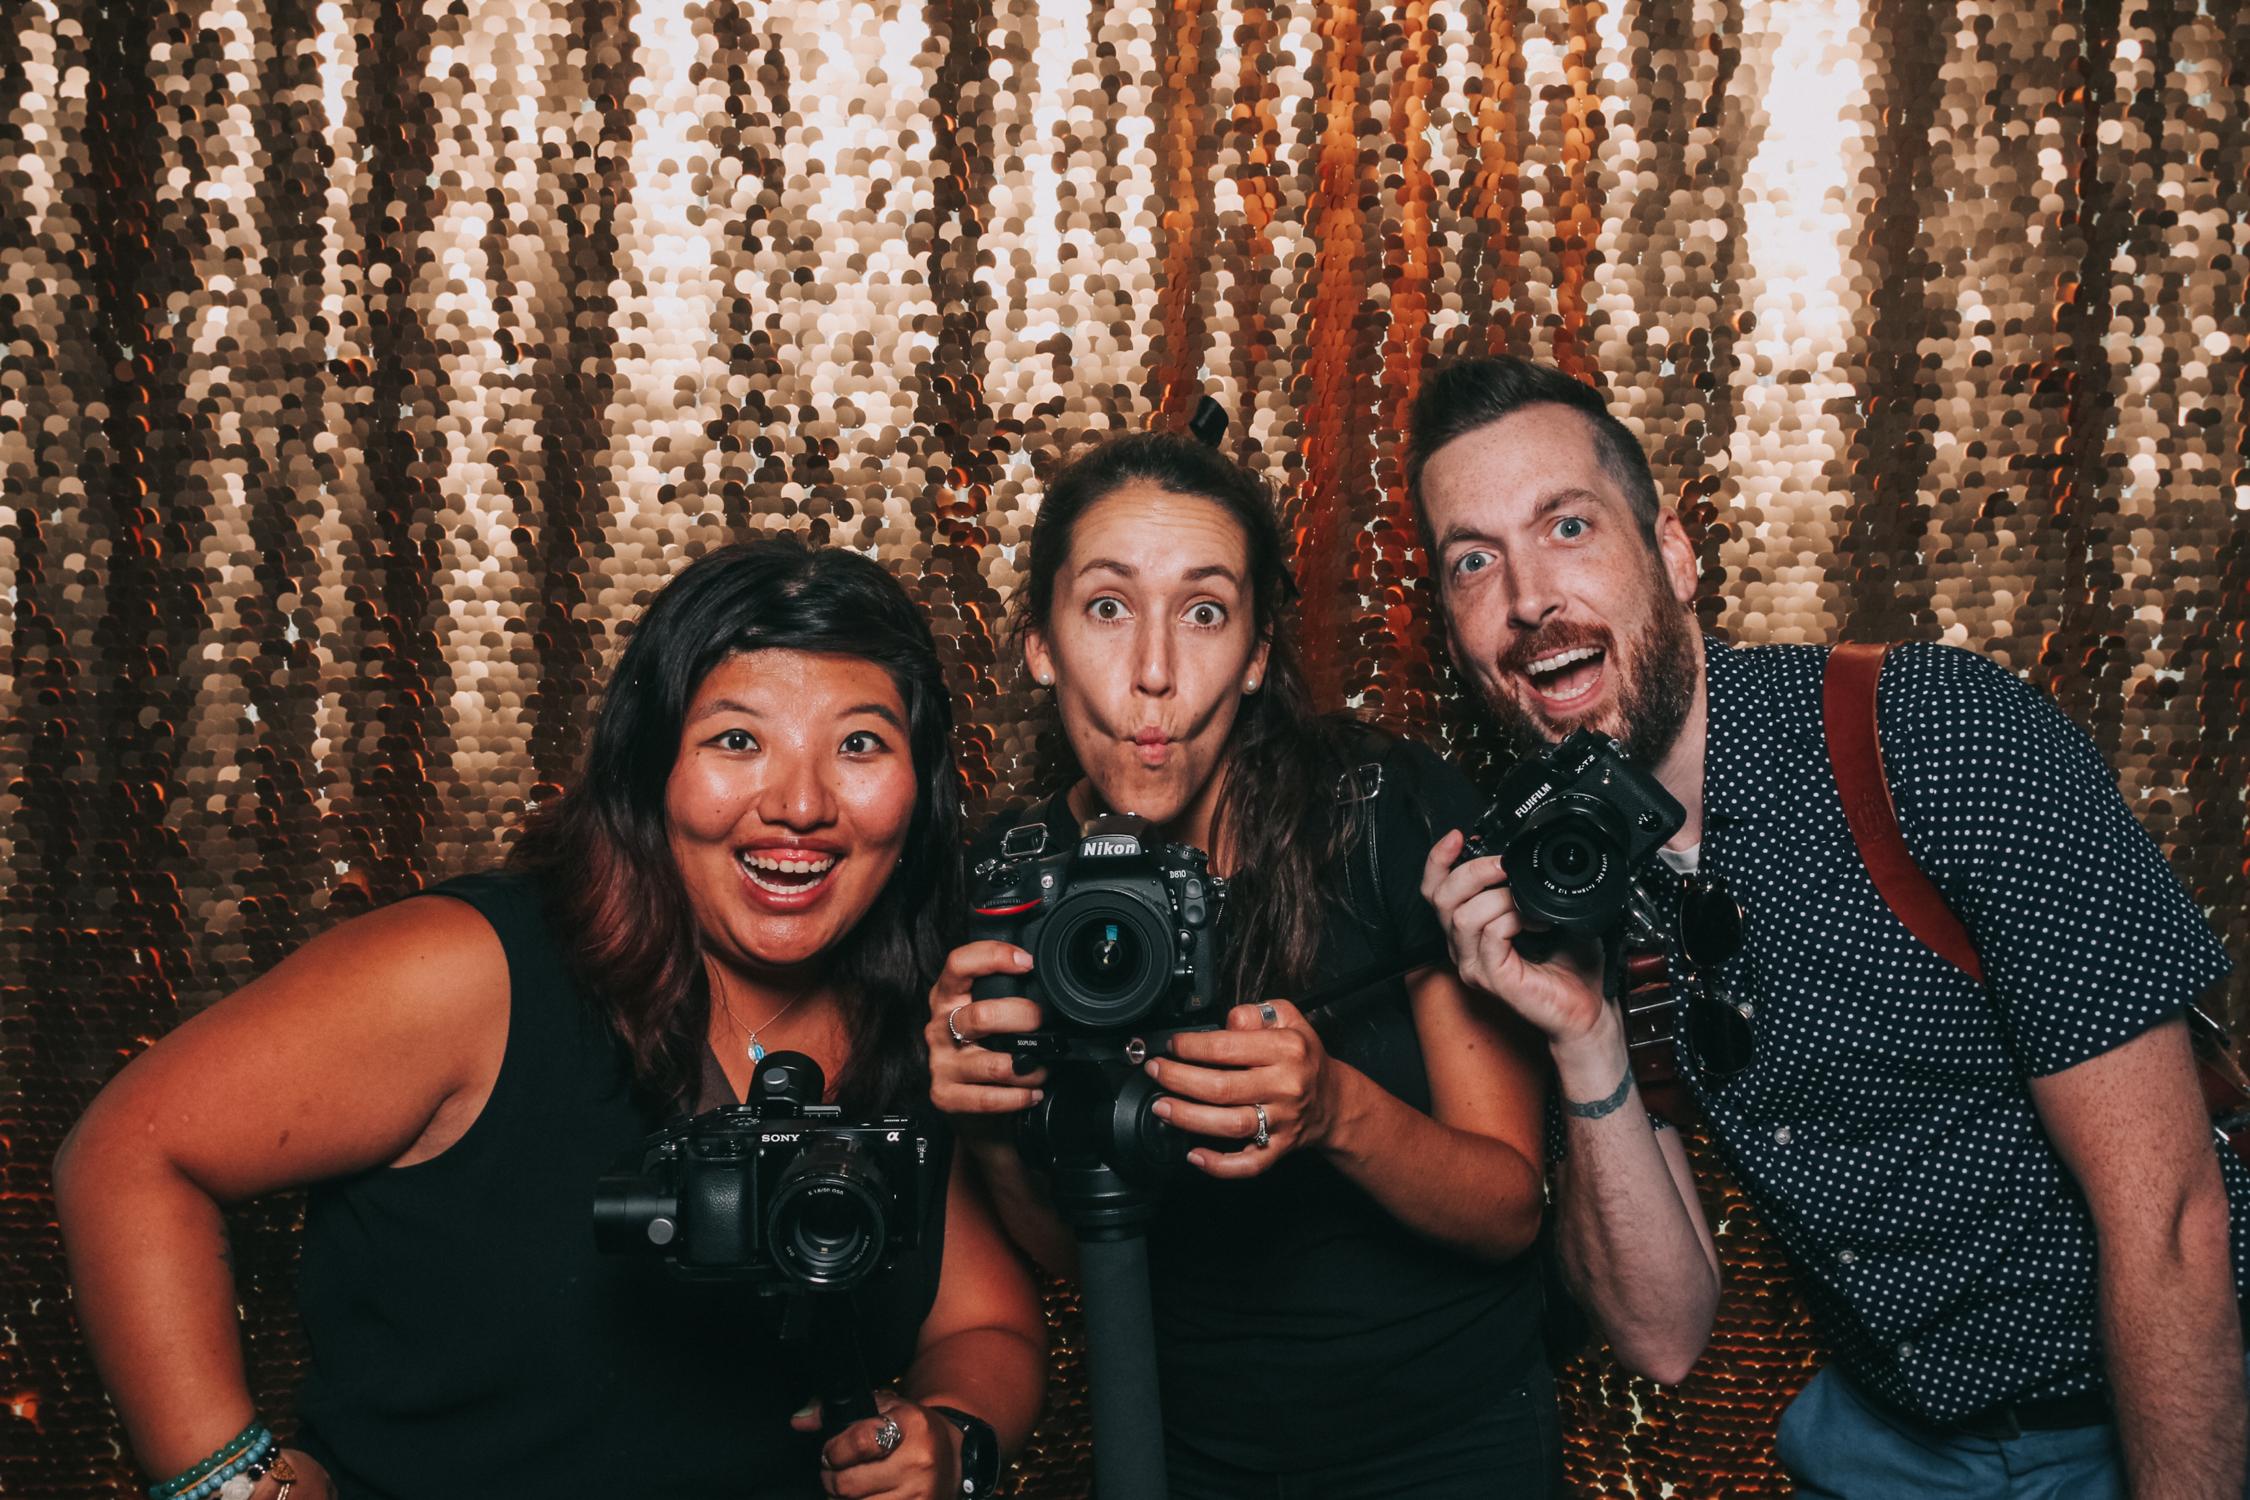 baltimore rusty scupper wedding photo booth-8.jpg